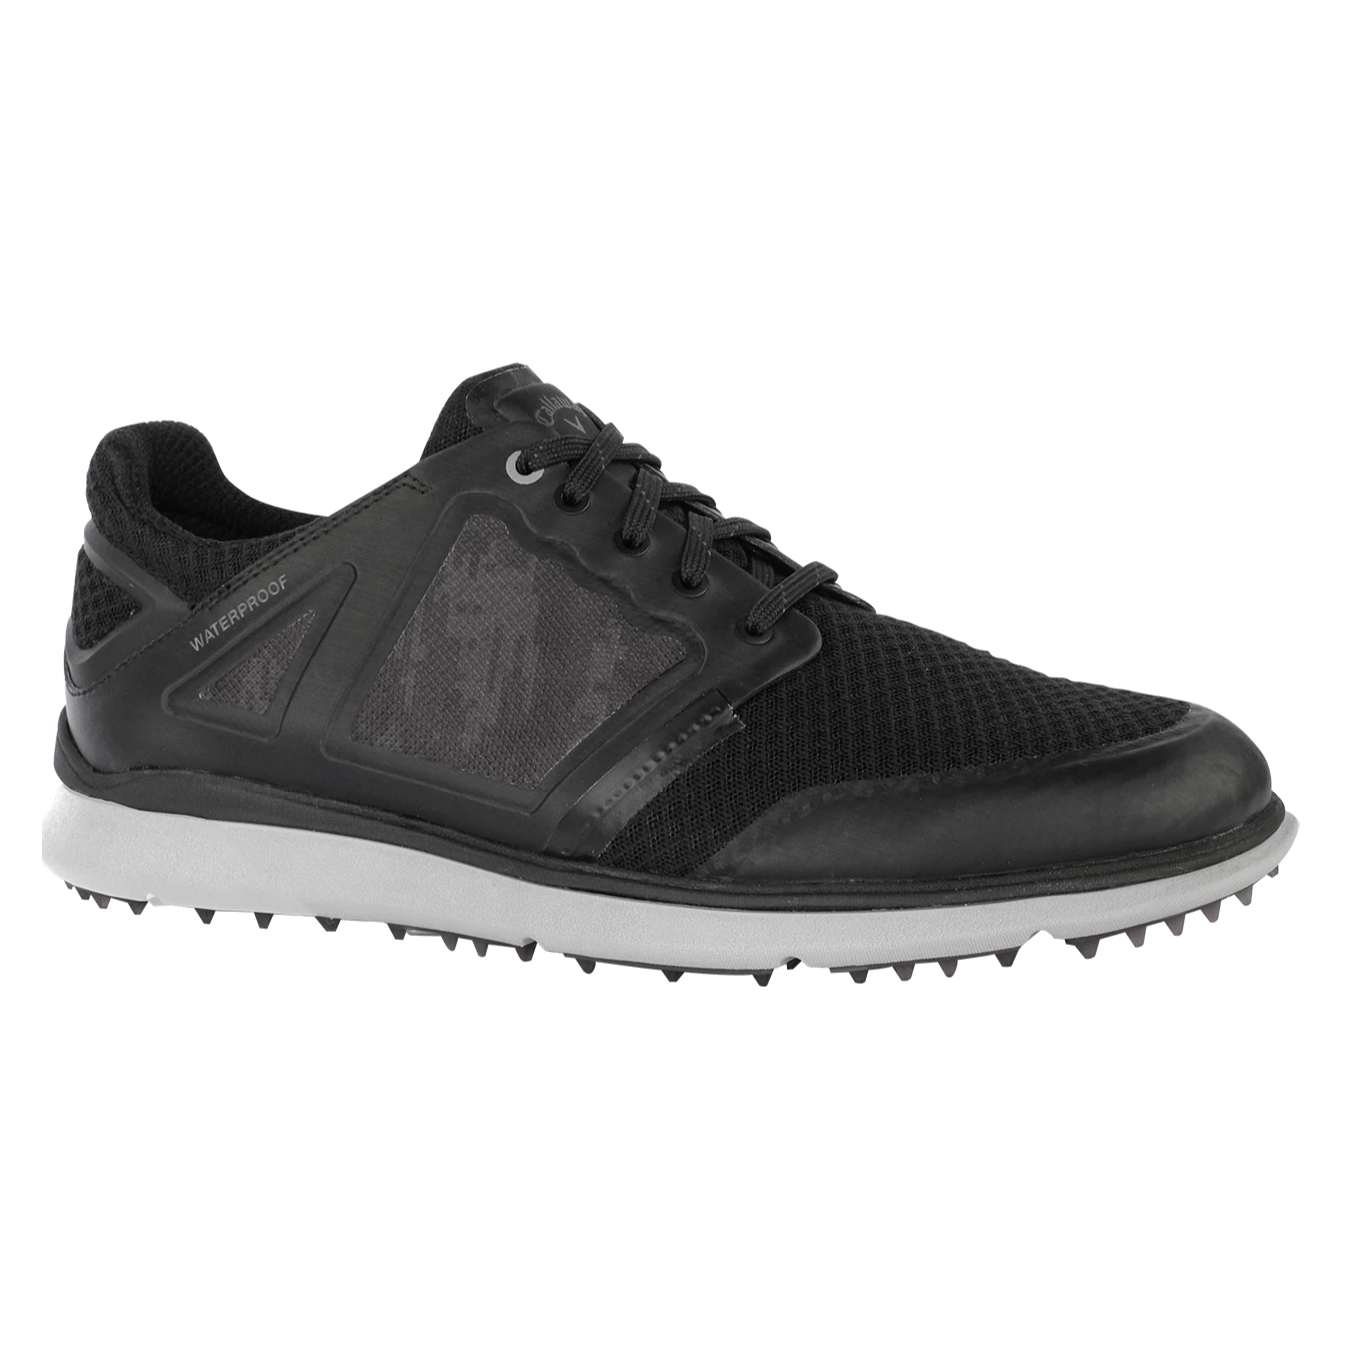 Callaway 2018 Highland Mens Golf Shoes